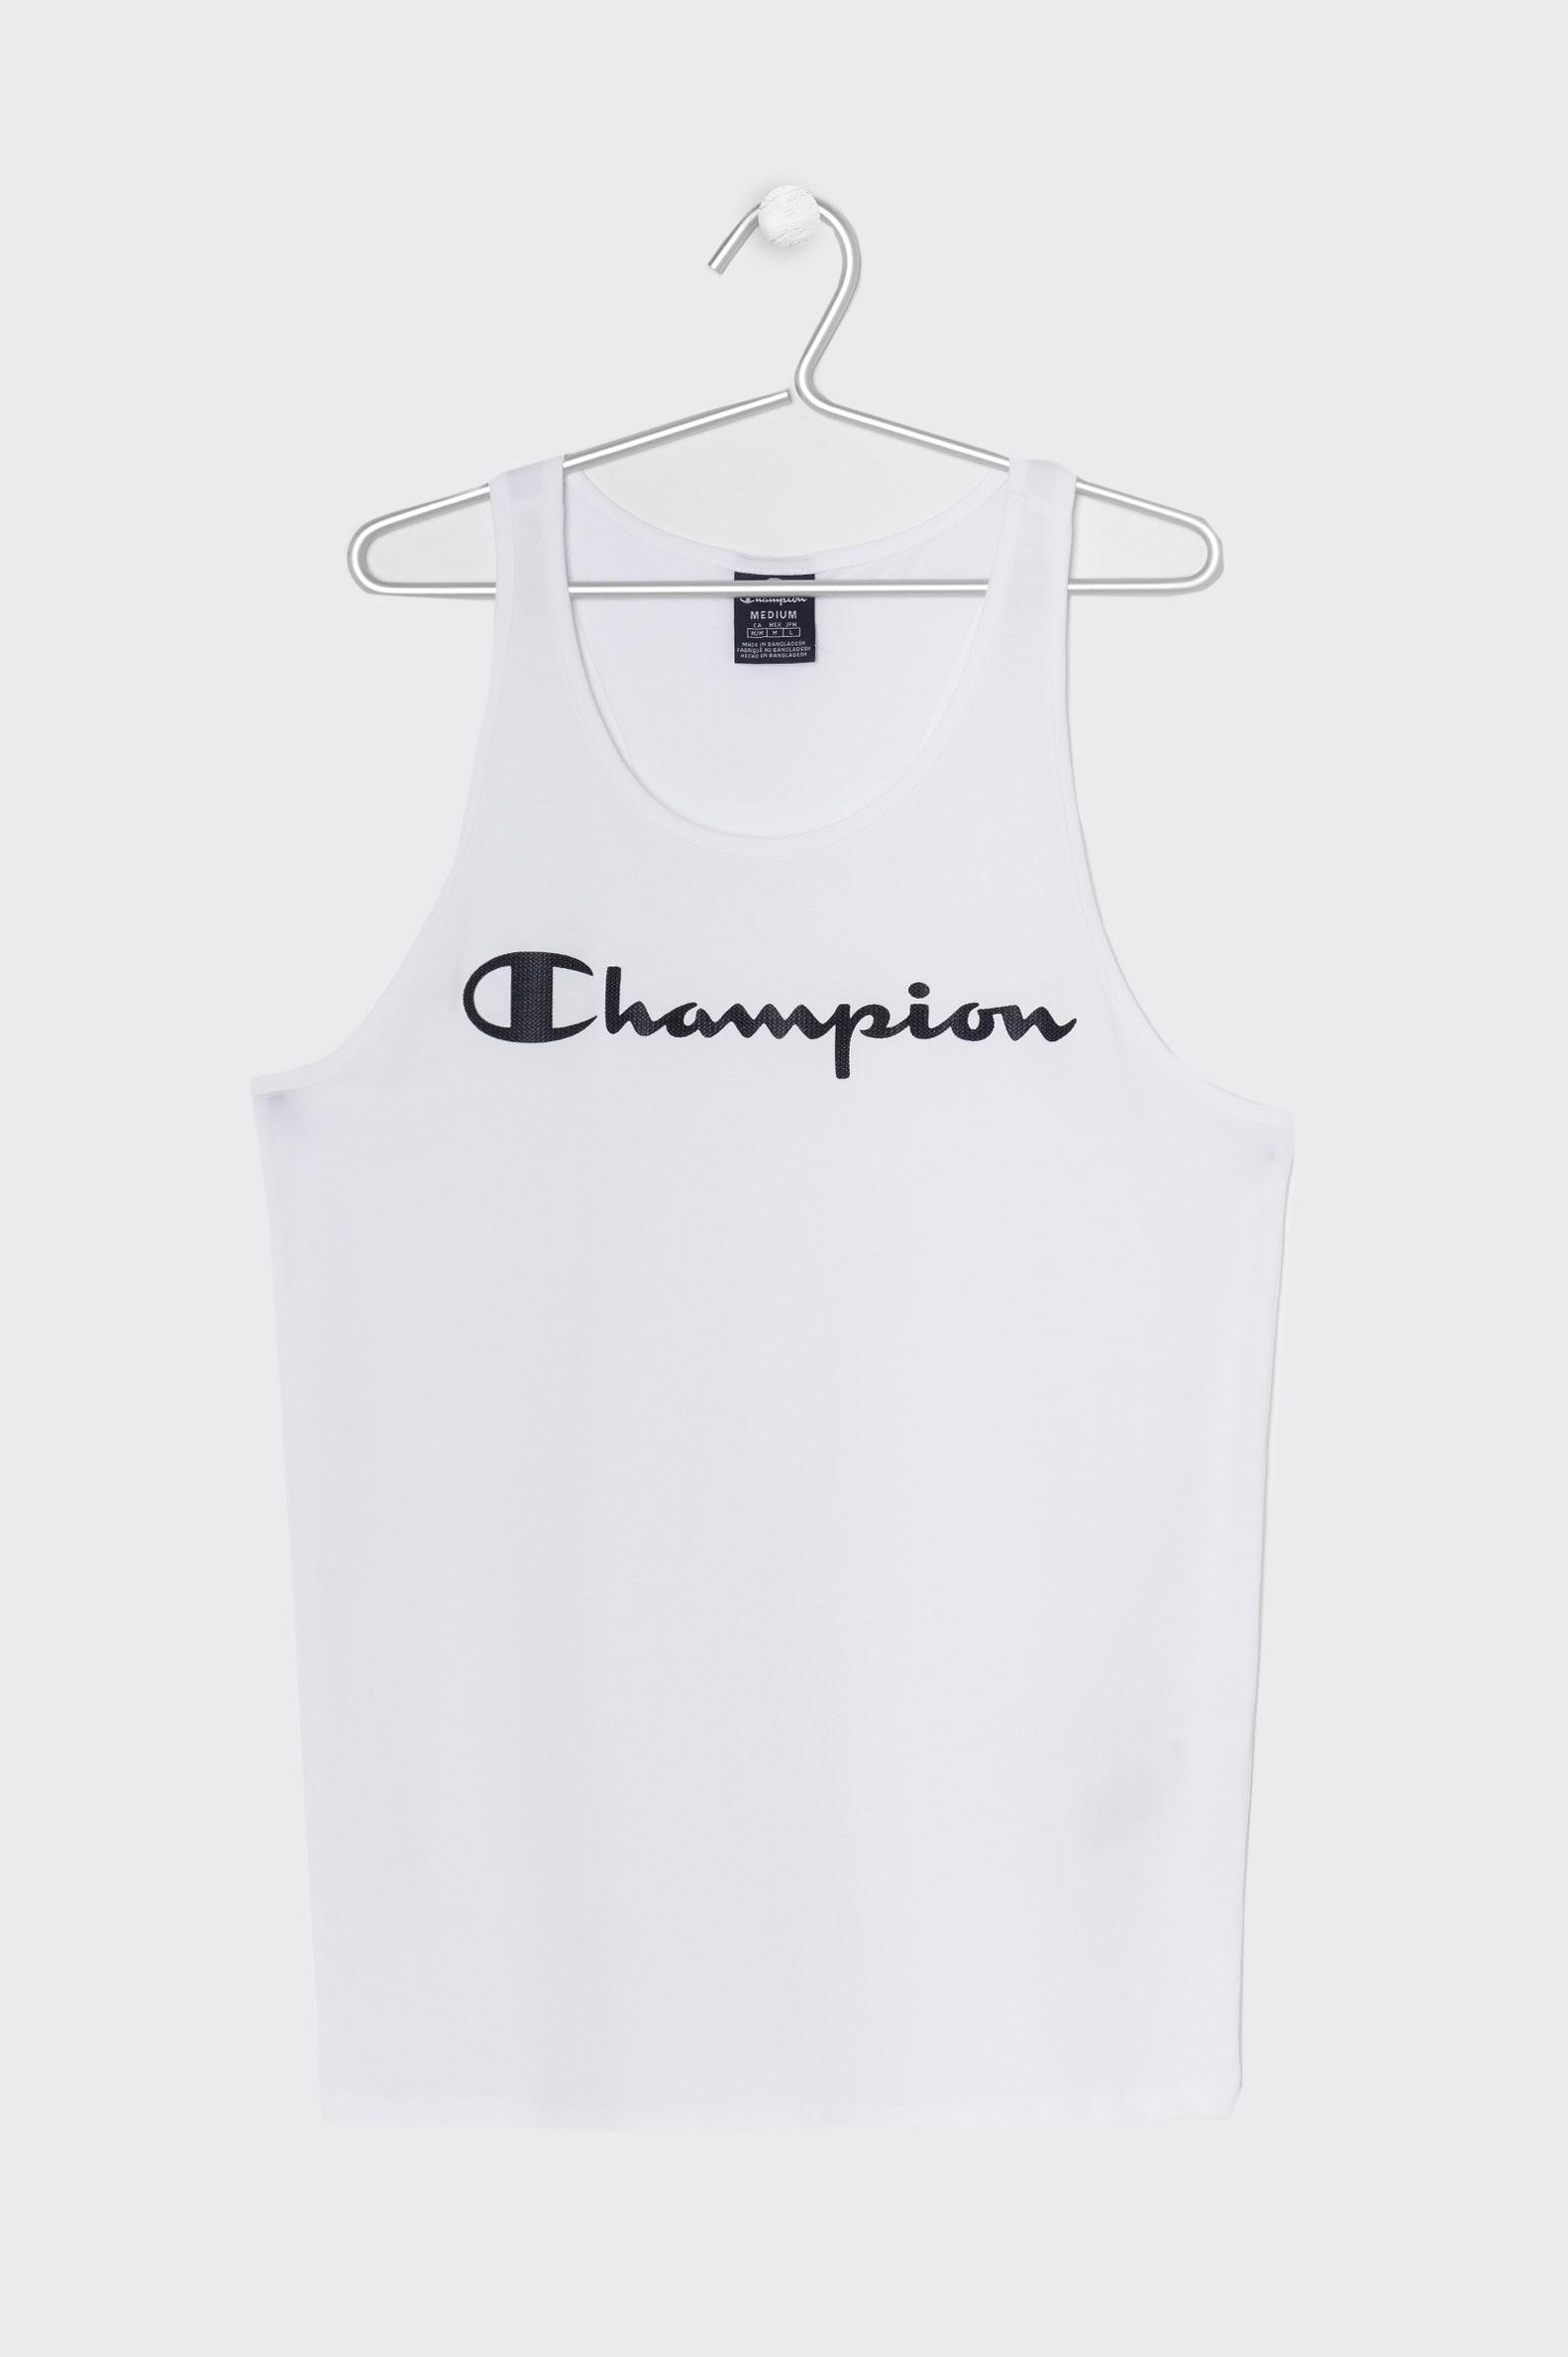 T-SHIRT MODE CHAMPION 214145 HOMME